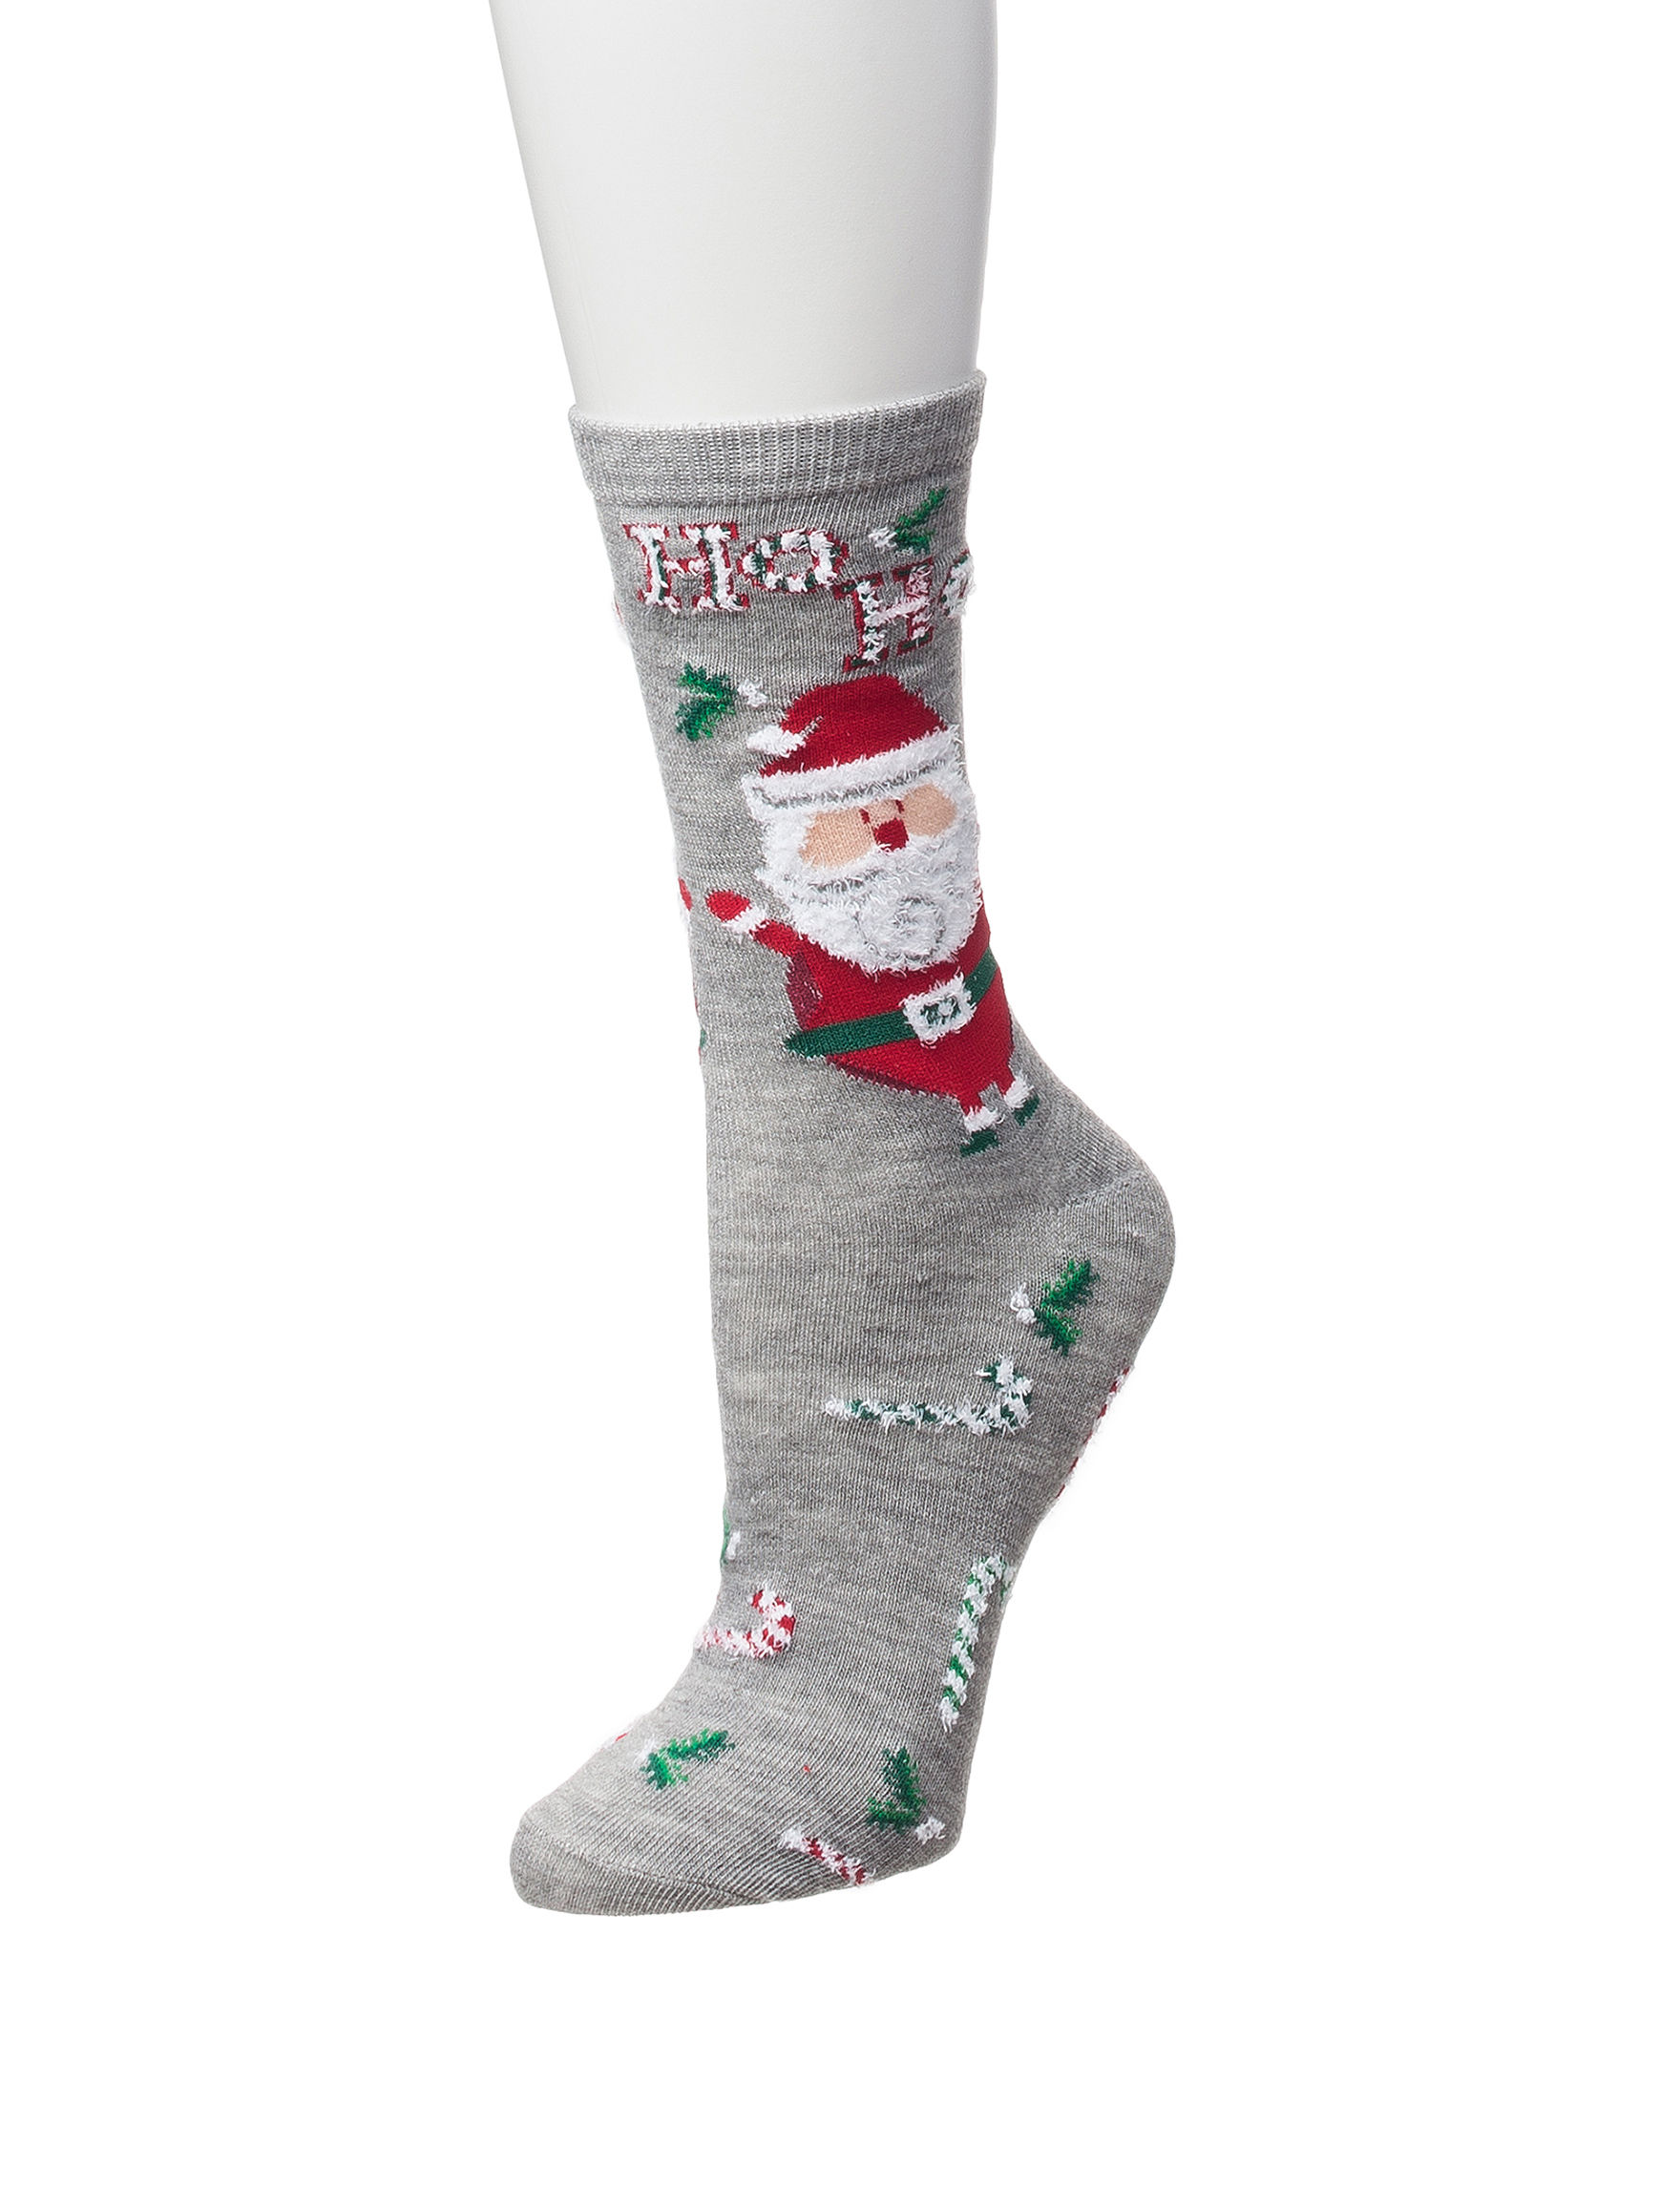 Happy Holidays Grey Socks